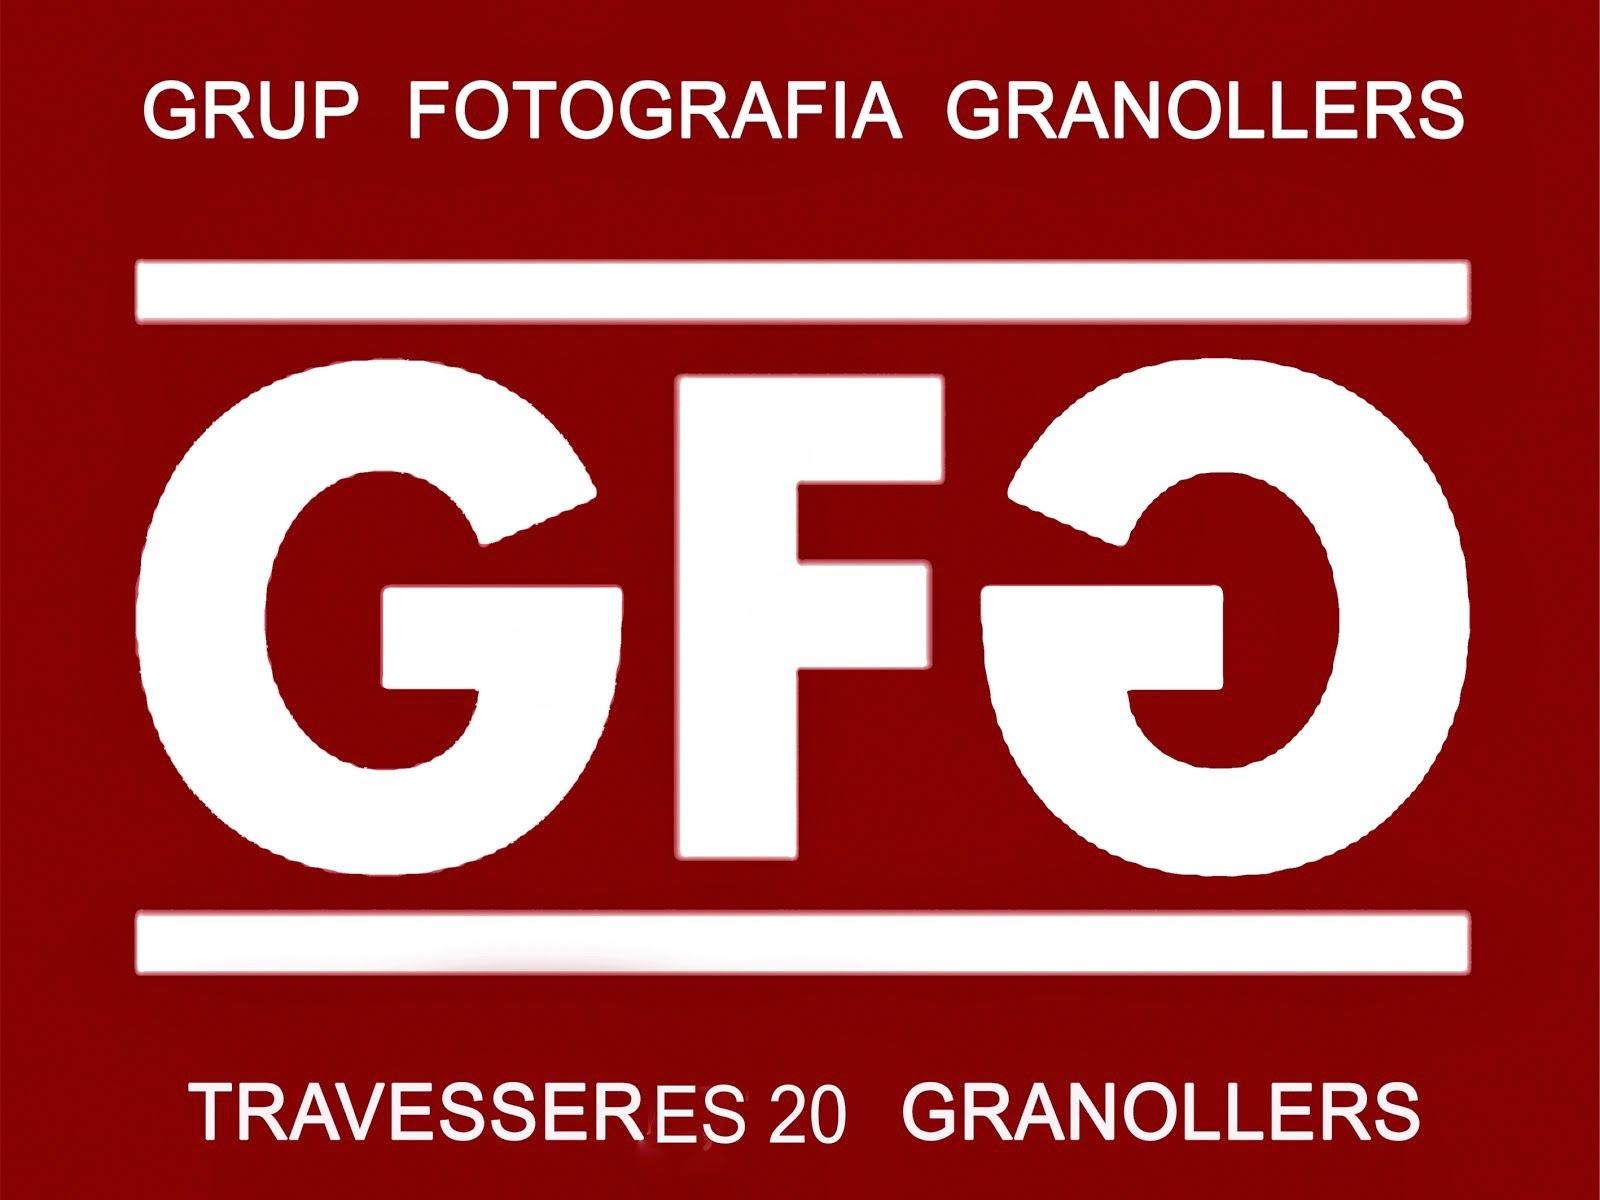 Grup Fotografia Granollers